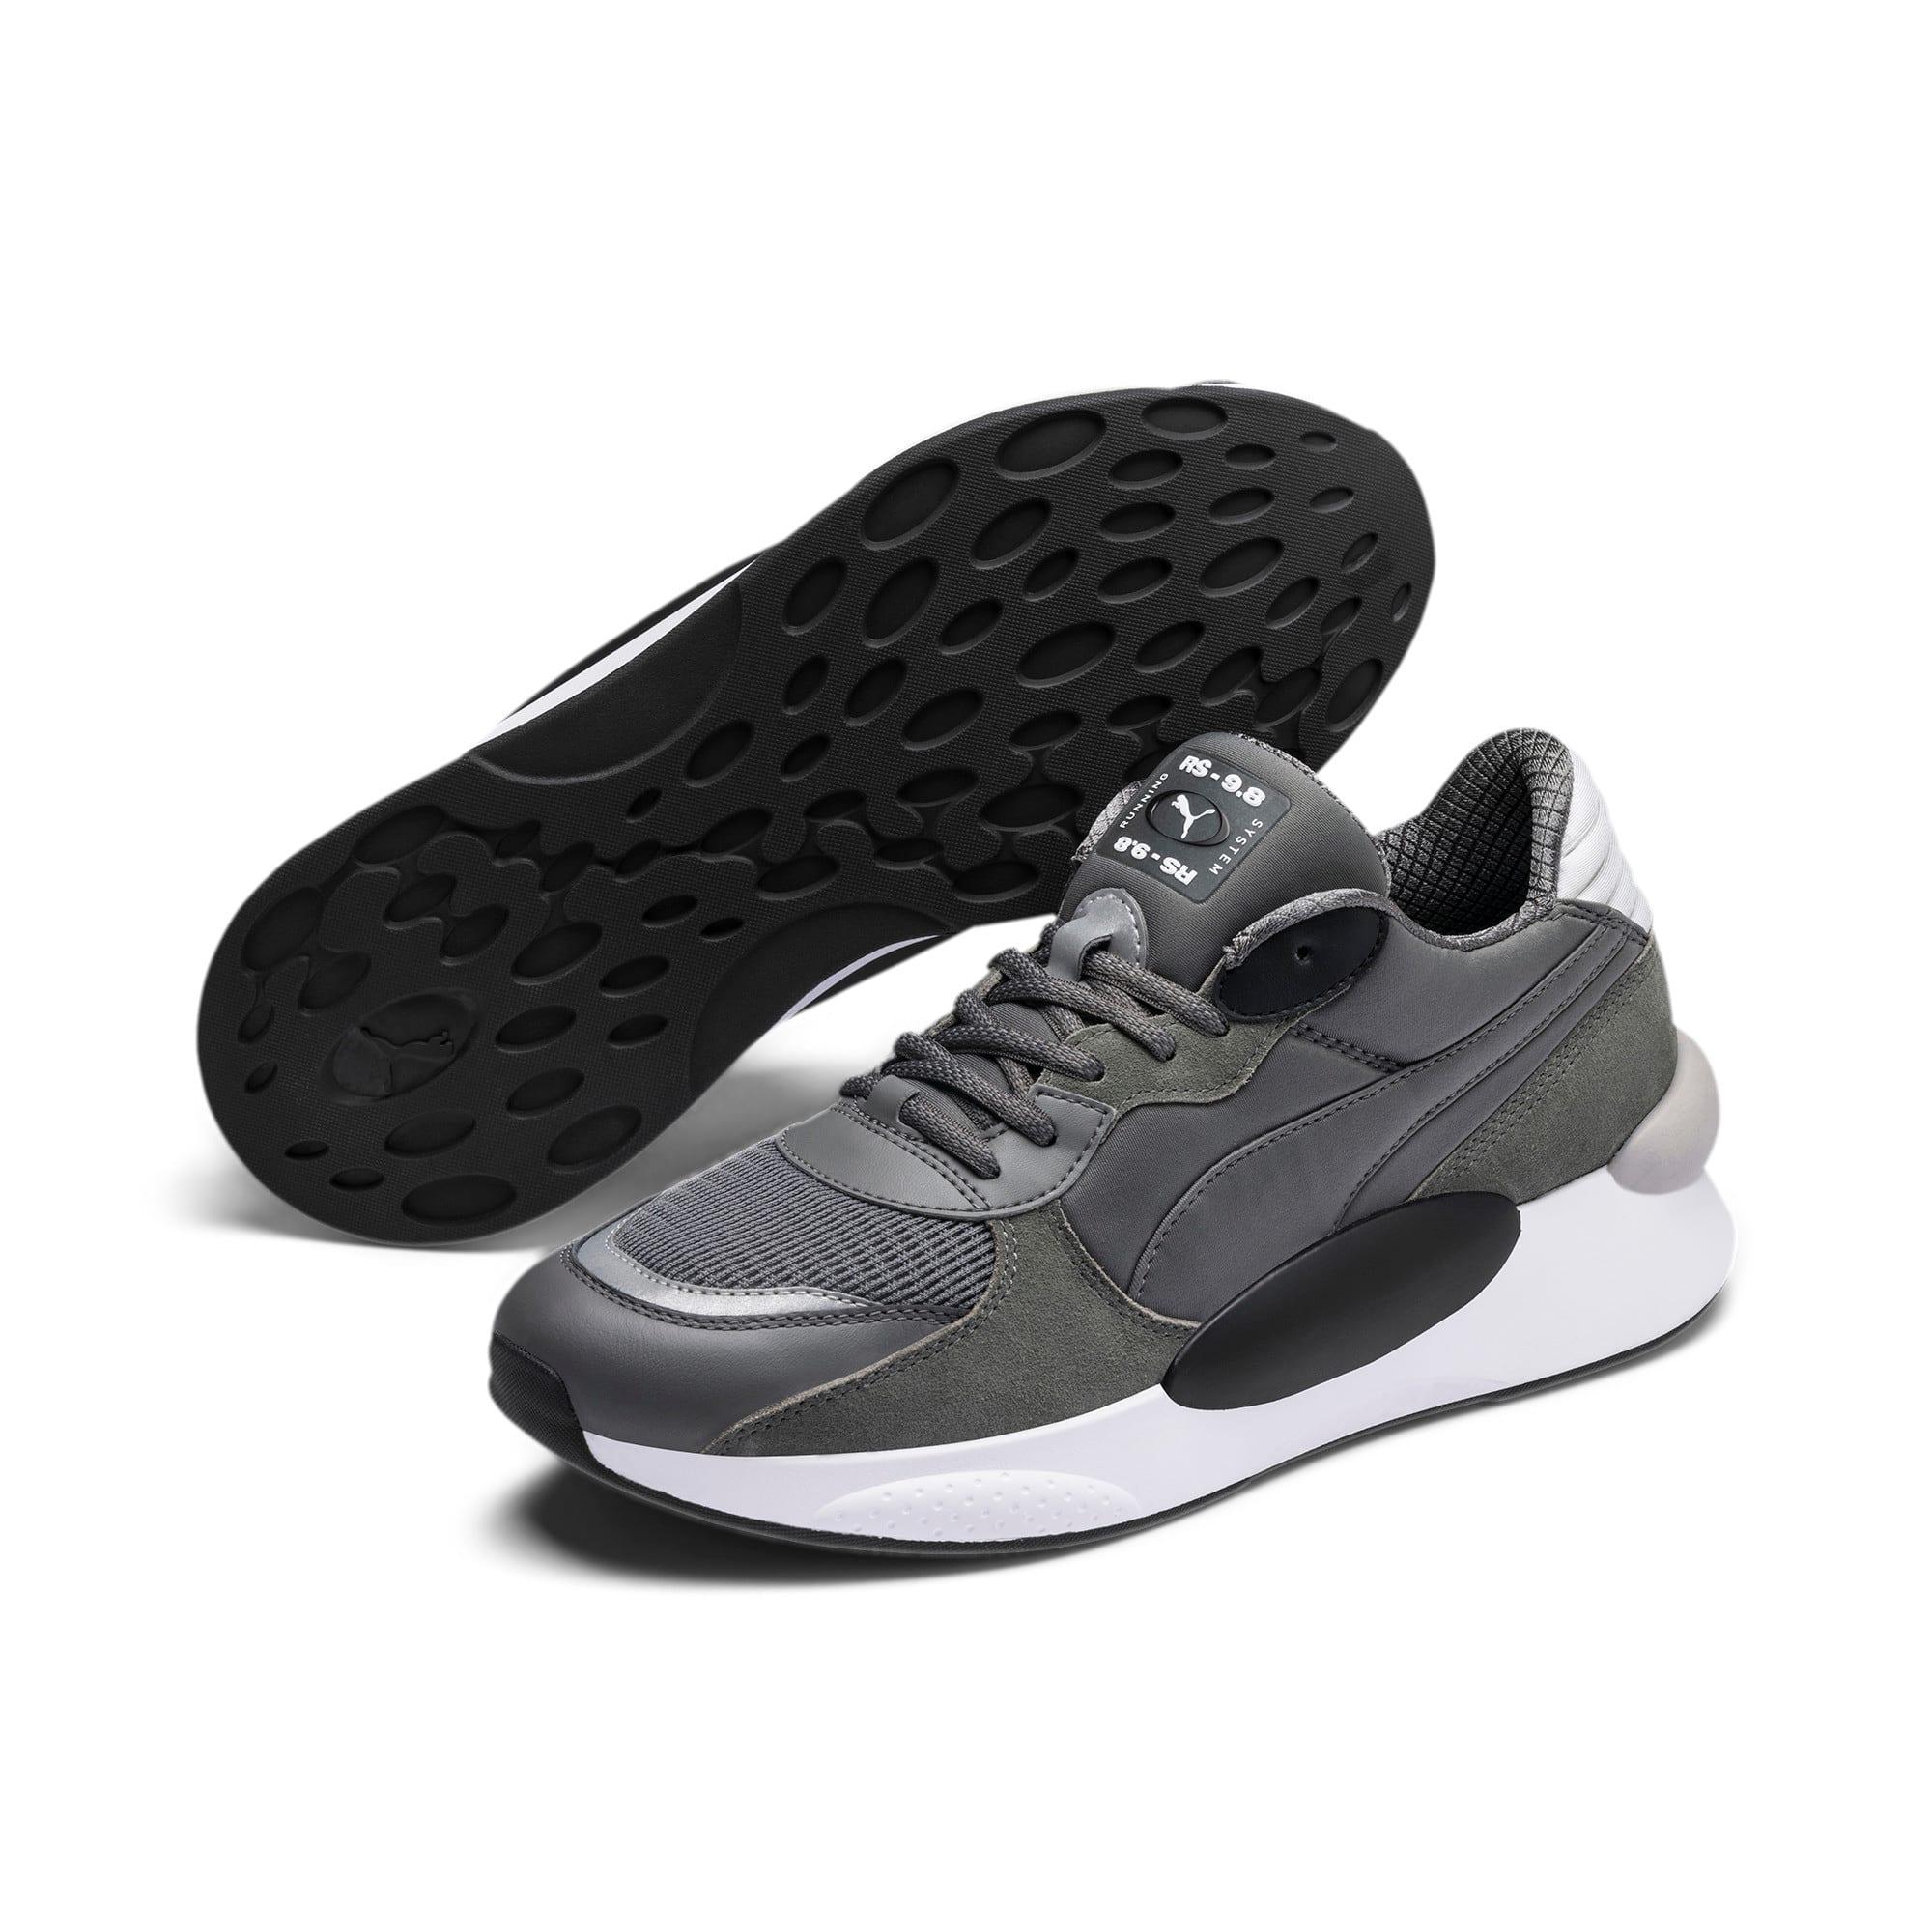 Thumbnail 2 of RS 9.8 Gravity Sneakers, CASTLEROCK-Puma Black, medium